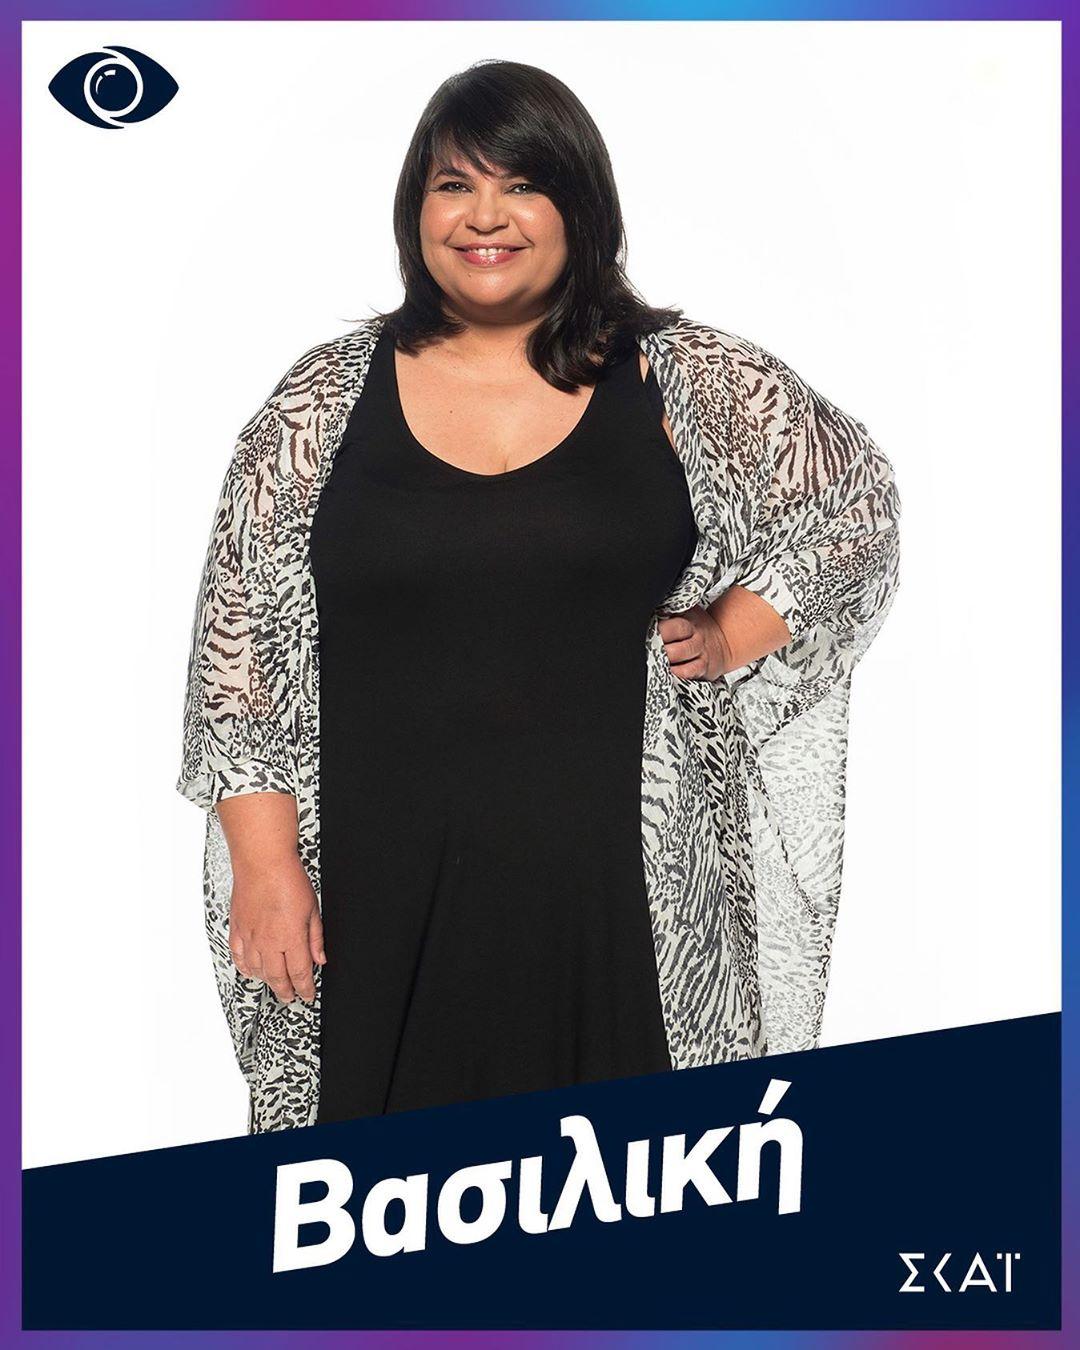 Big Brother: Κι άλλη έκπληξη – Αυτή είναι η 53χρονη νέα παίκτρια |  Gossip-tv.gr